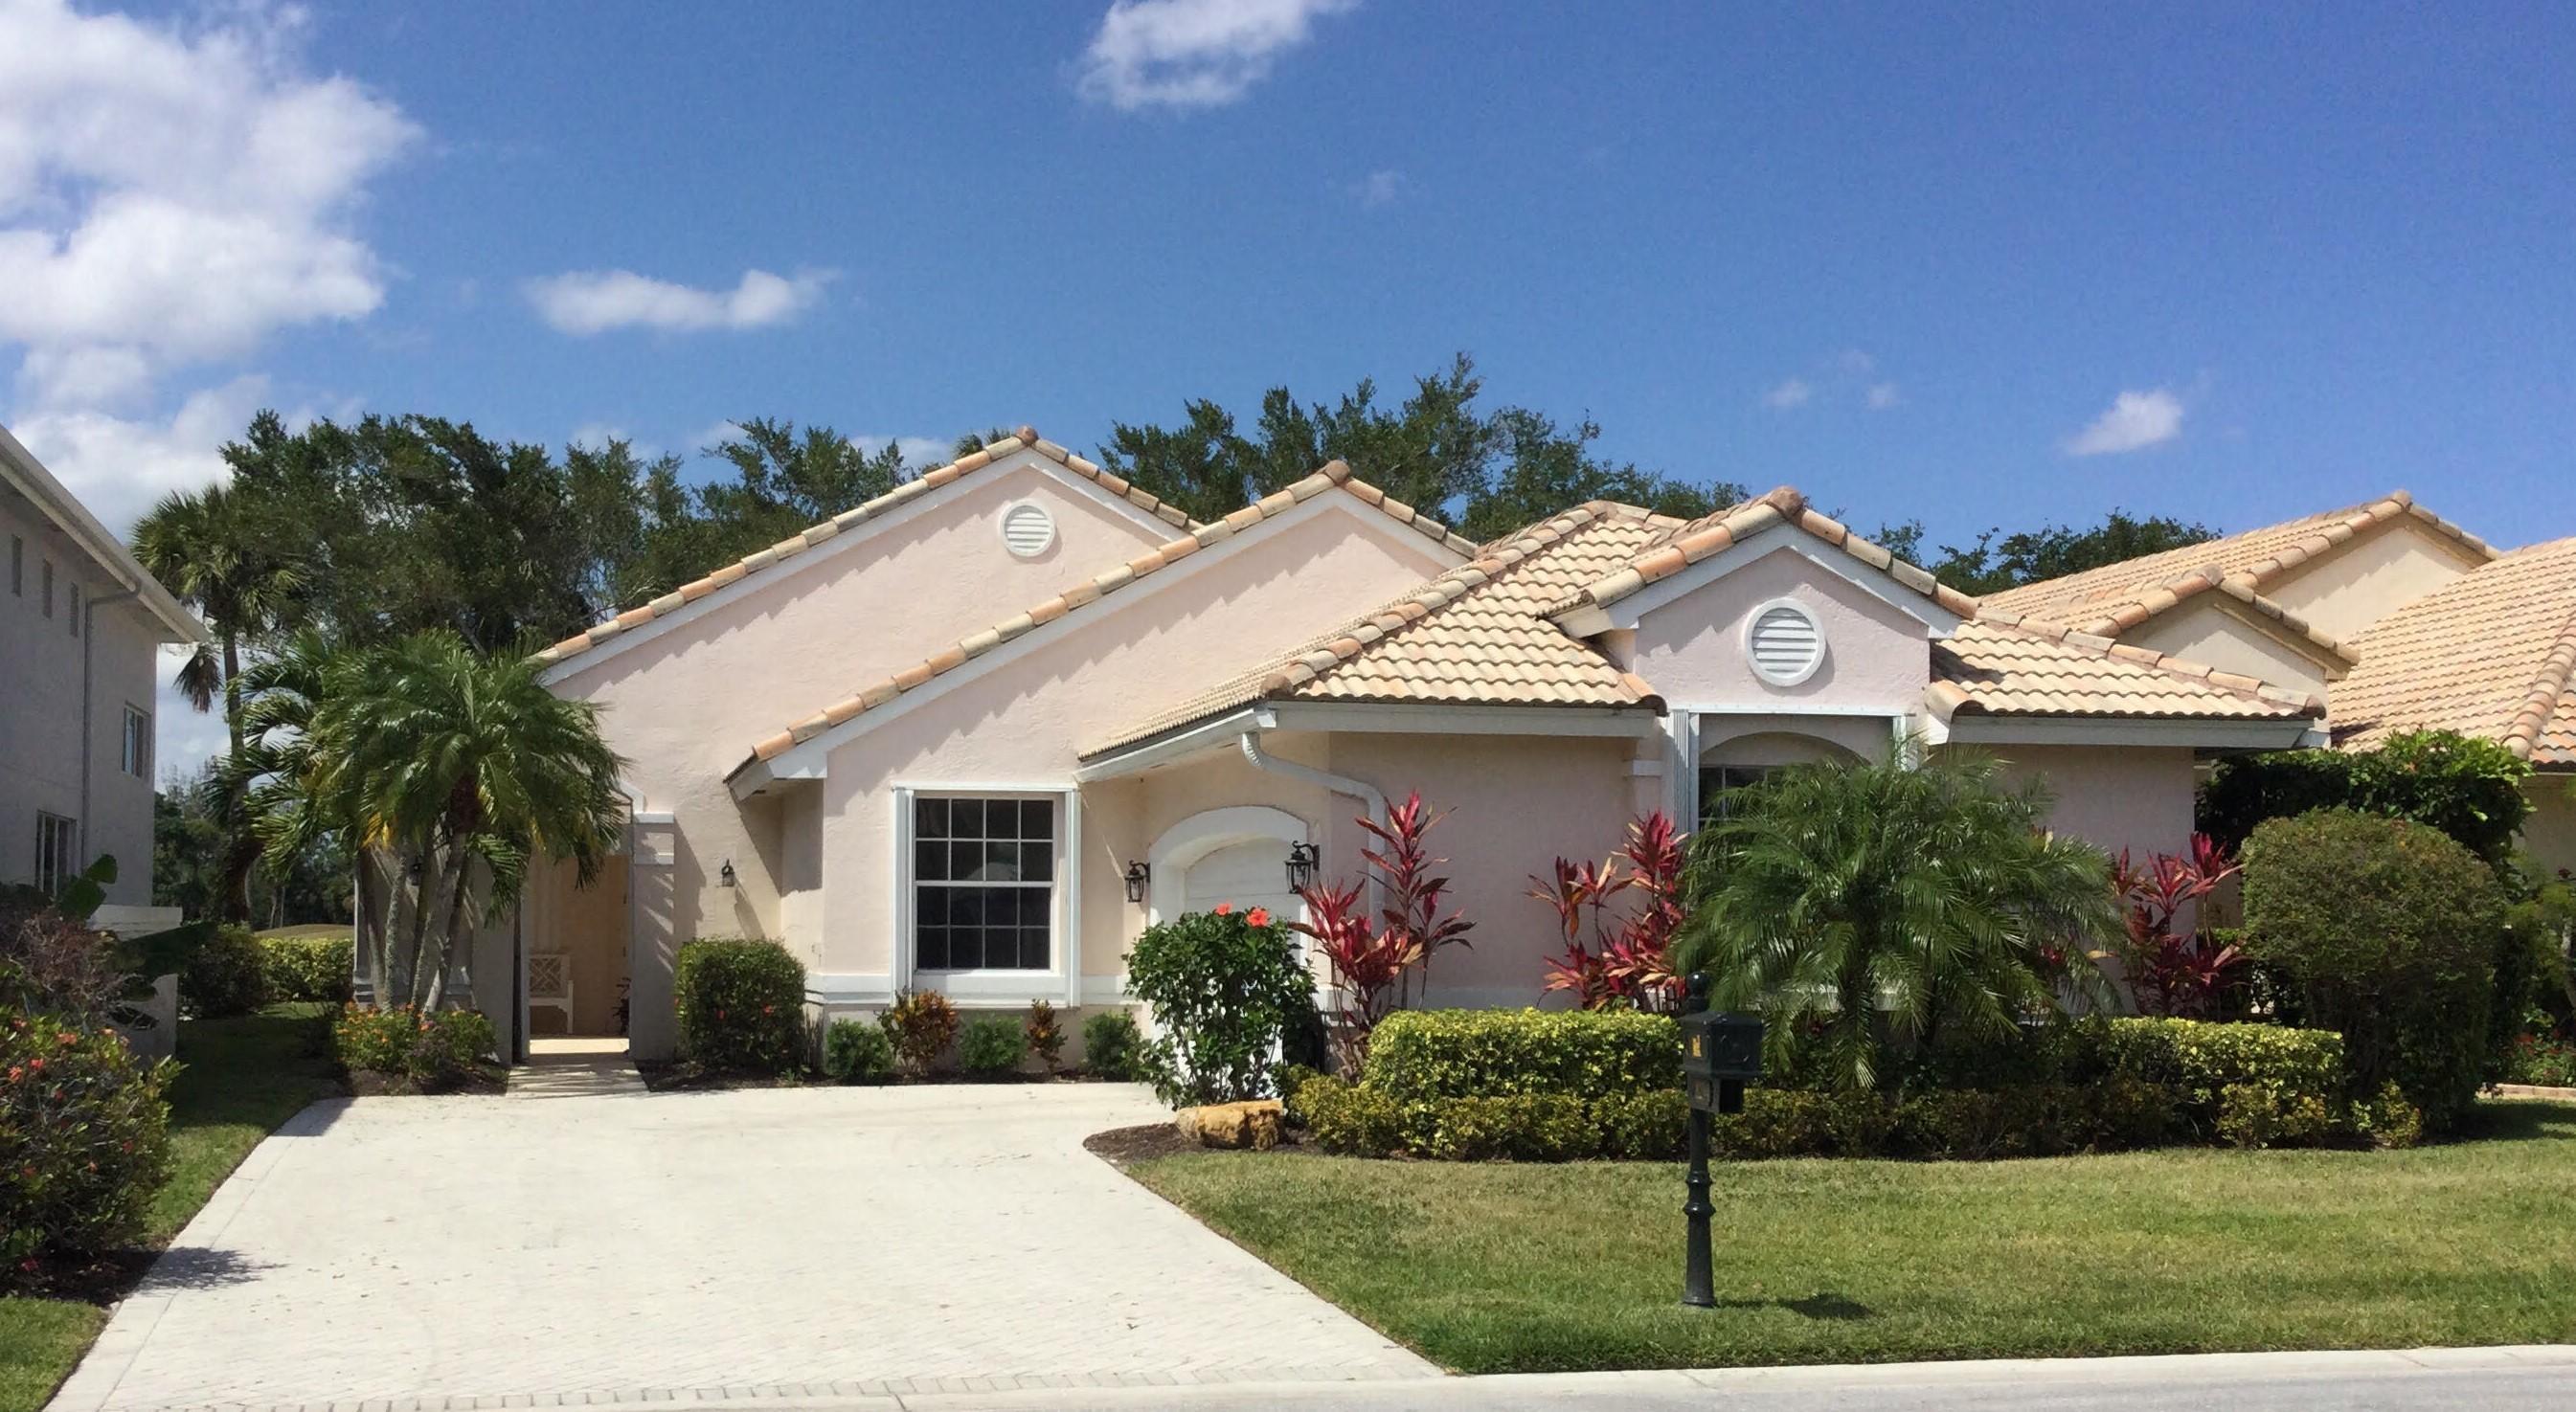 8294 Bob O Link Drive, West Palm Beach, Florida 33412, 3 Bedrooms Bedrooms, ,2 BathroomsBathrooms,A,Single family,Bob O Link,RX-10704134